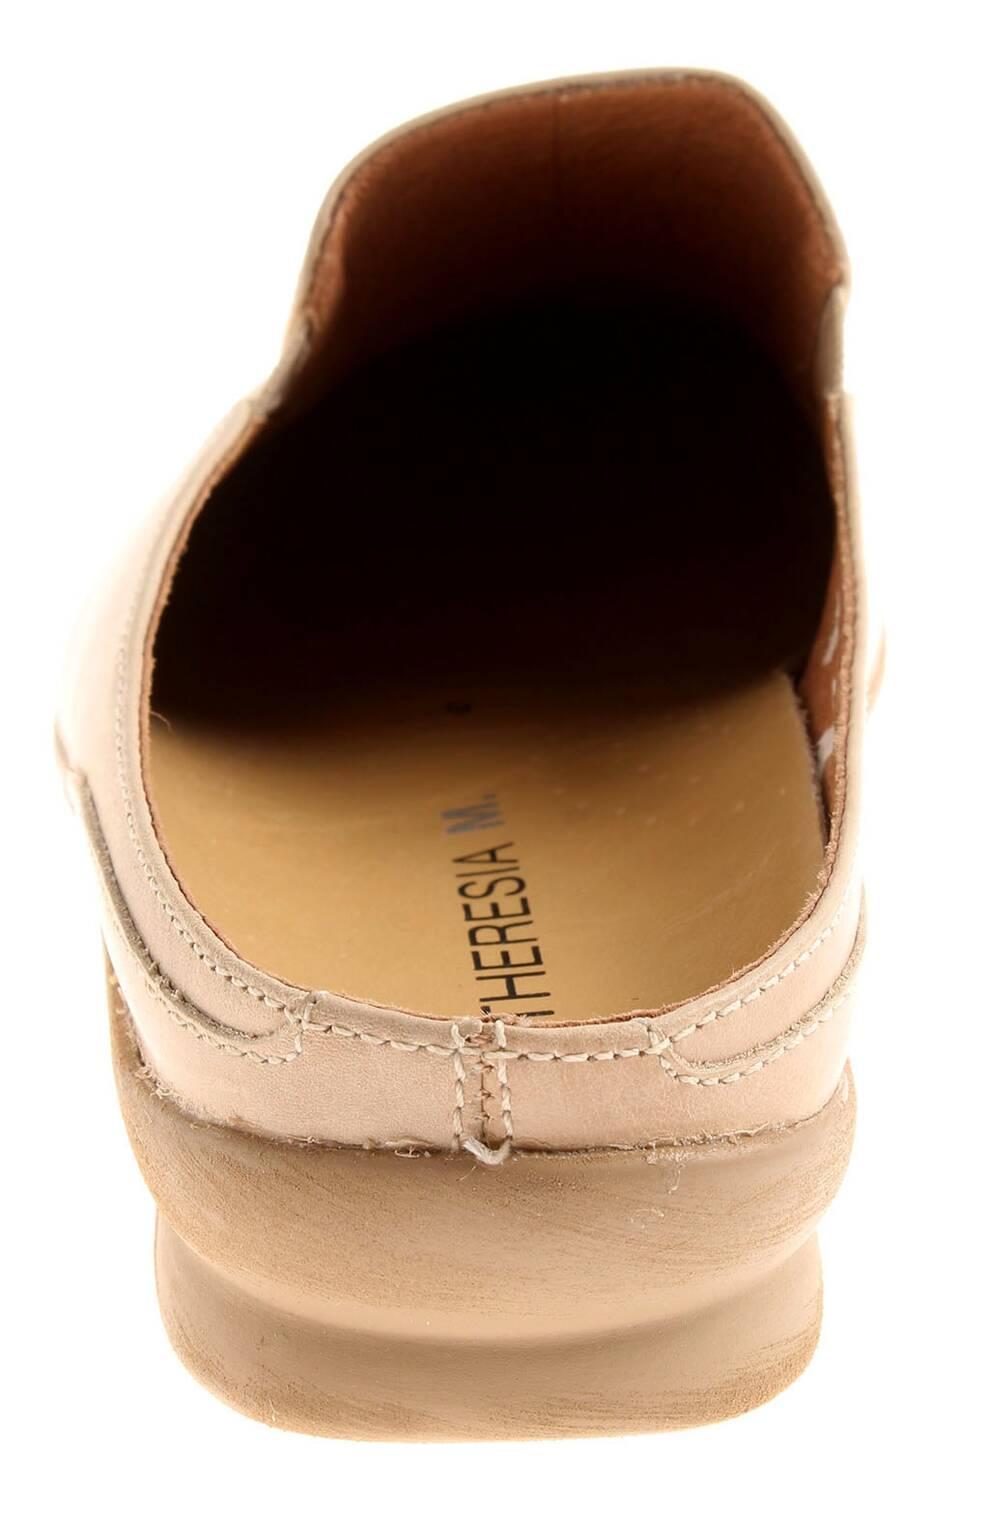 Theresia Lederschuhe M.Sabot Lederschuhe Theresia Damenschuhe Damen Schuhe Leder 62230 dadfbb